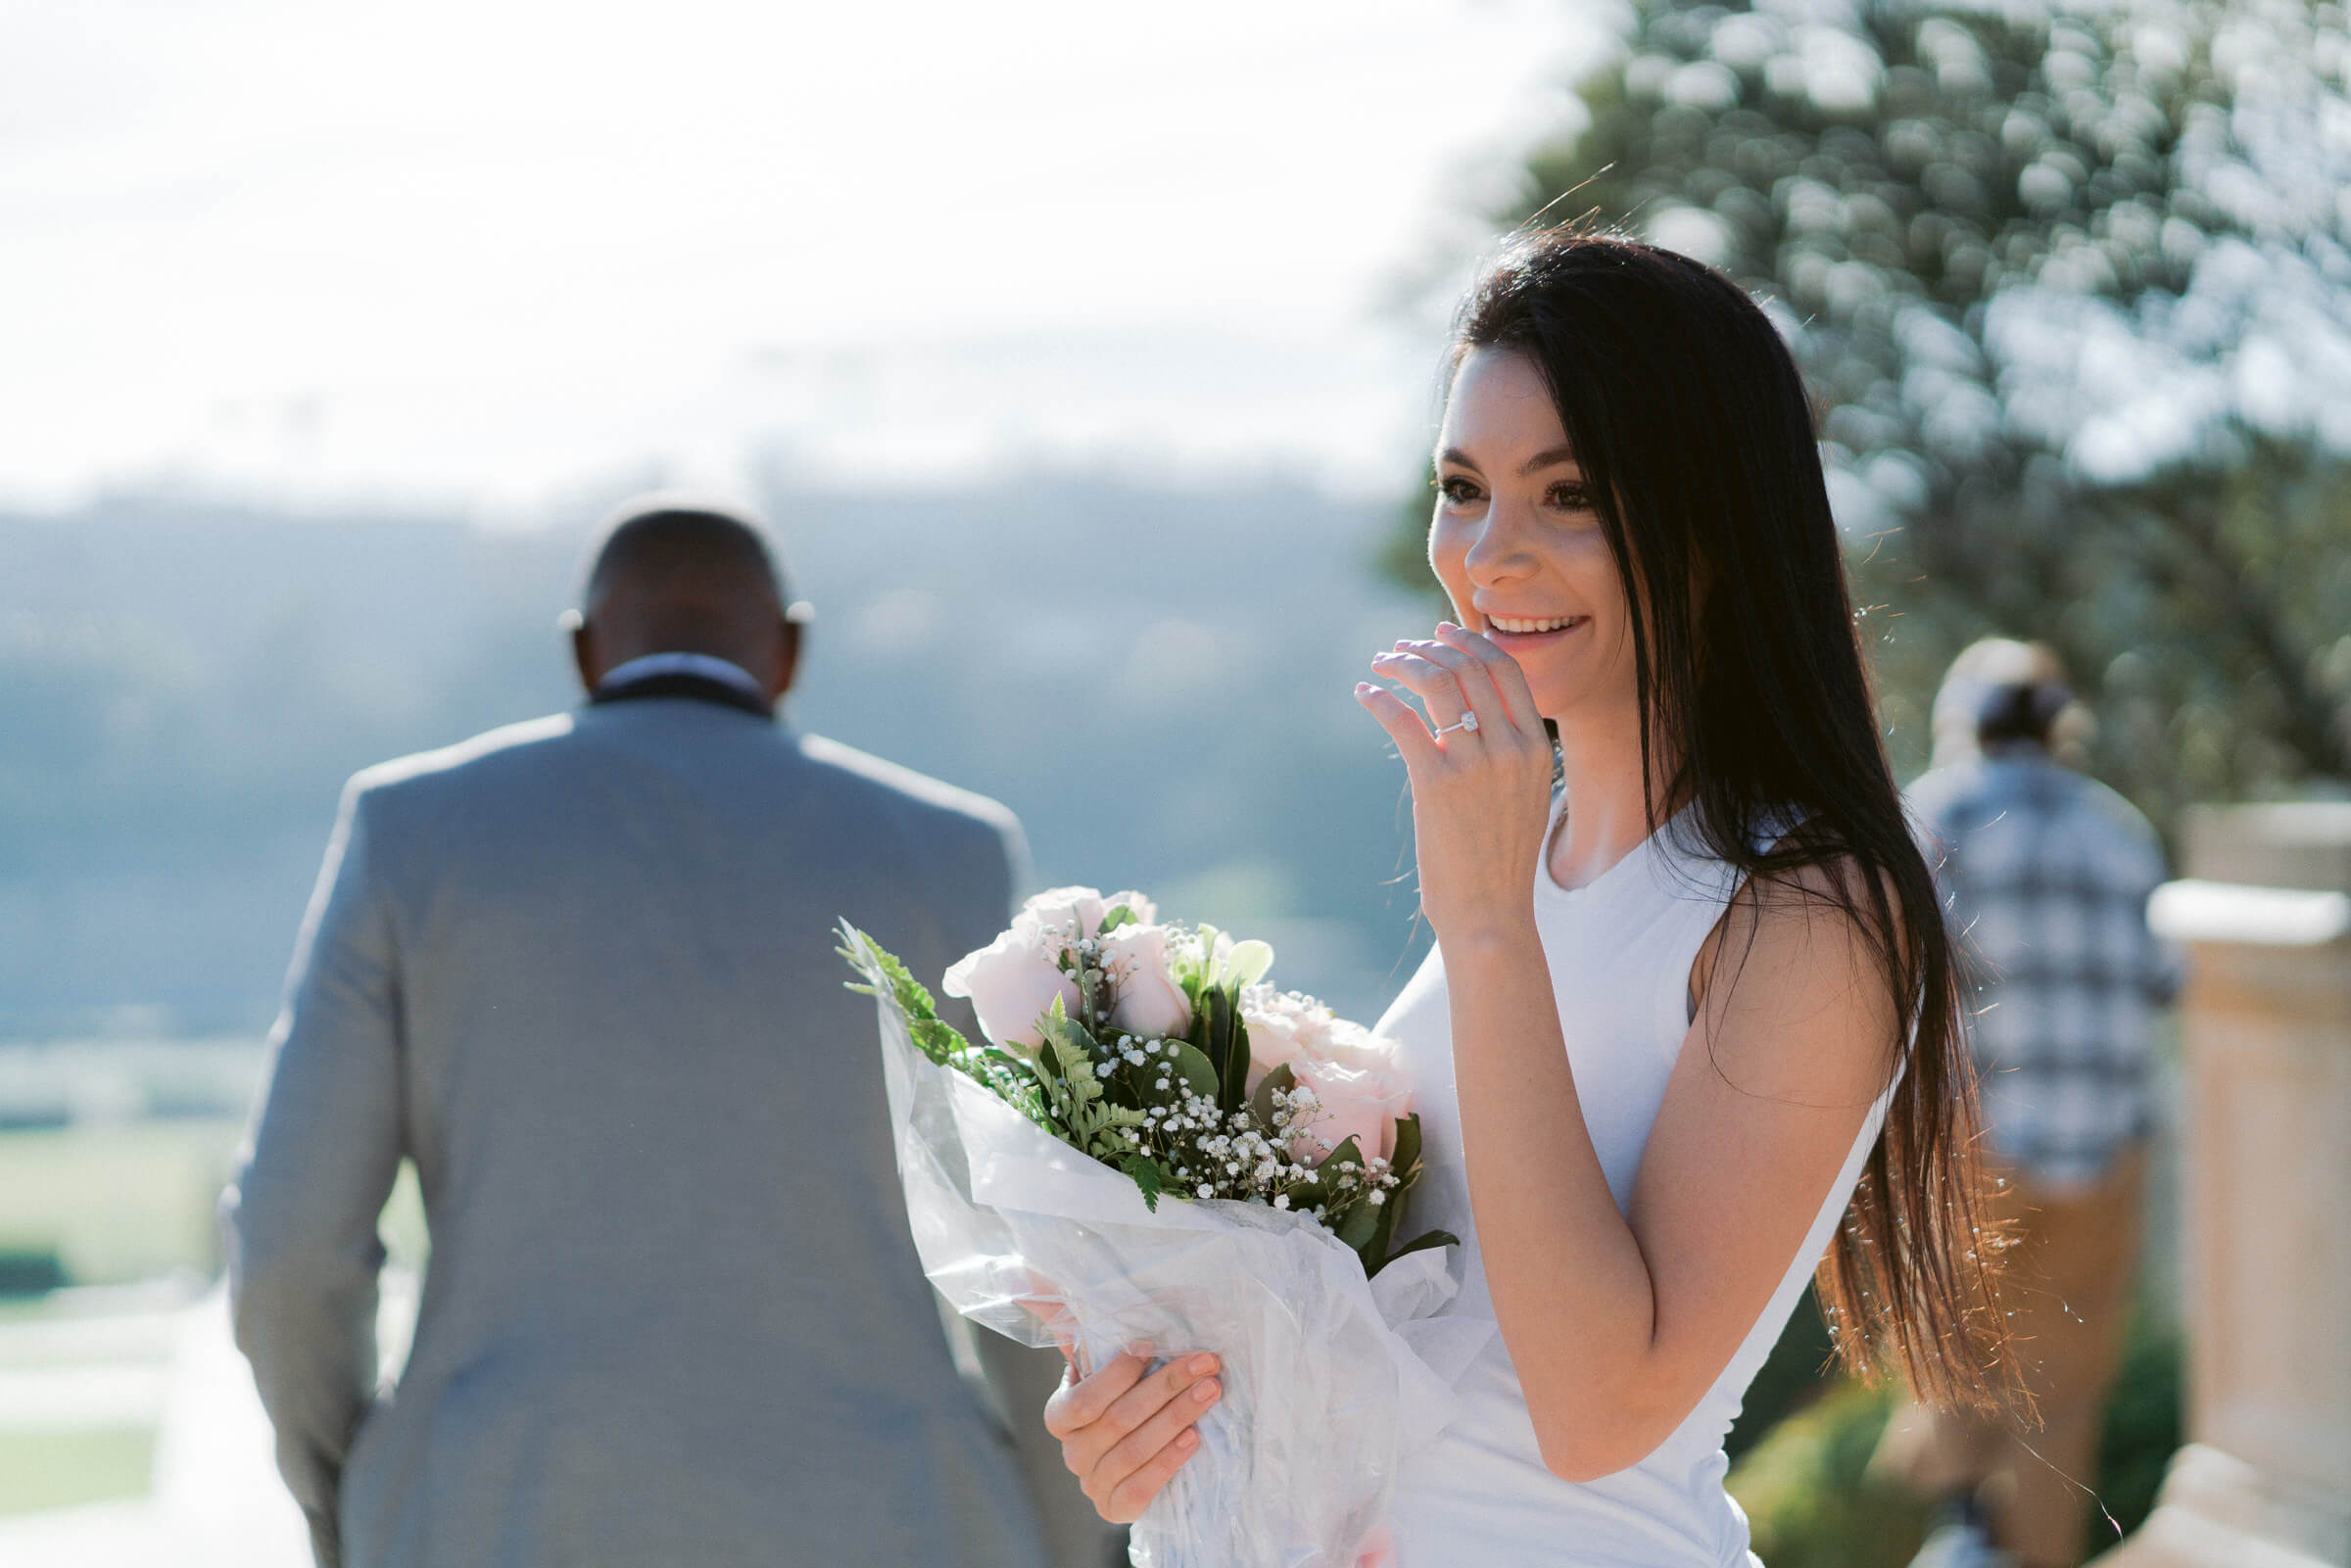 ucla-los-angeles-proposal-photographer-20.jpg